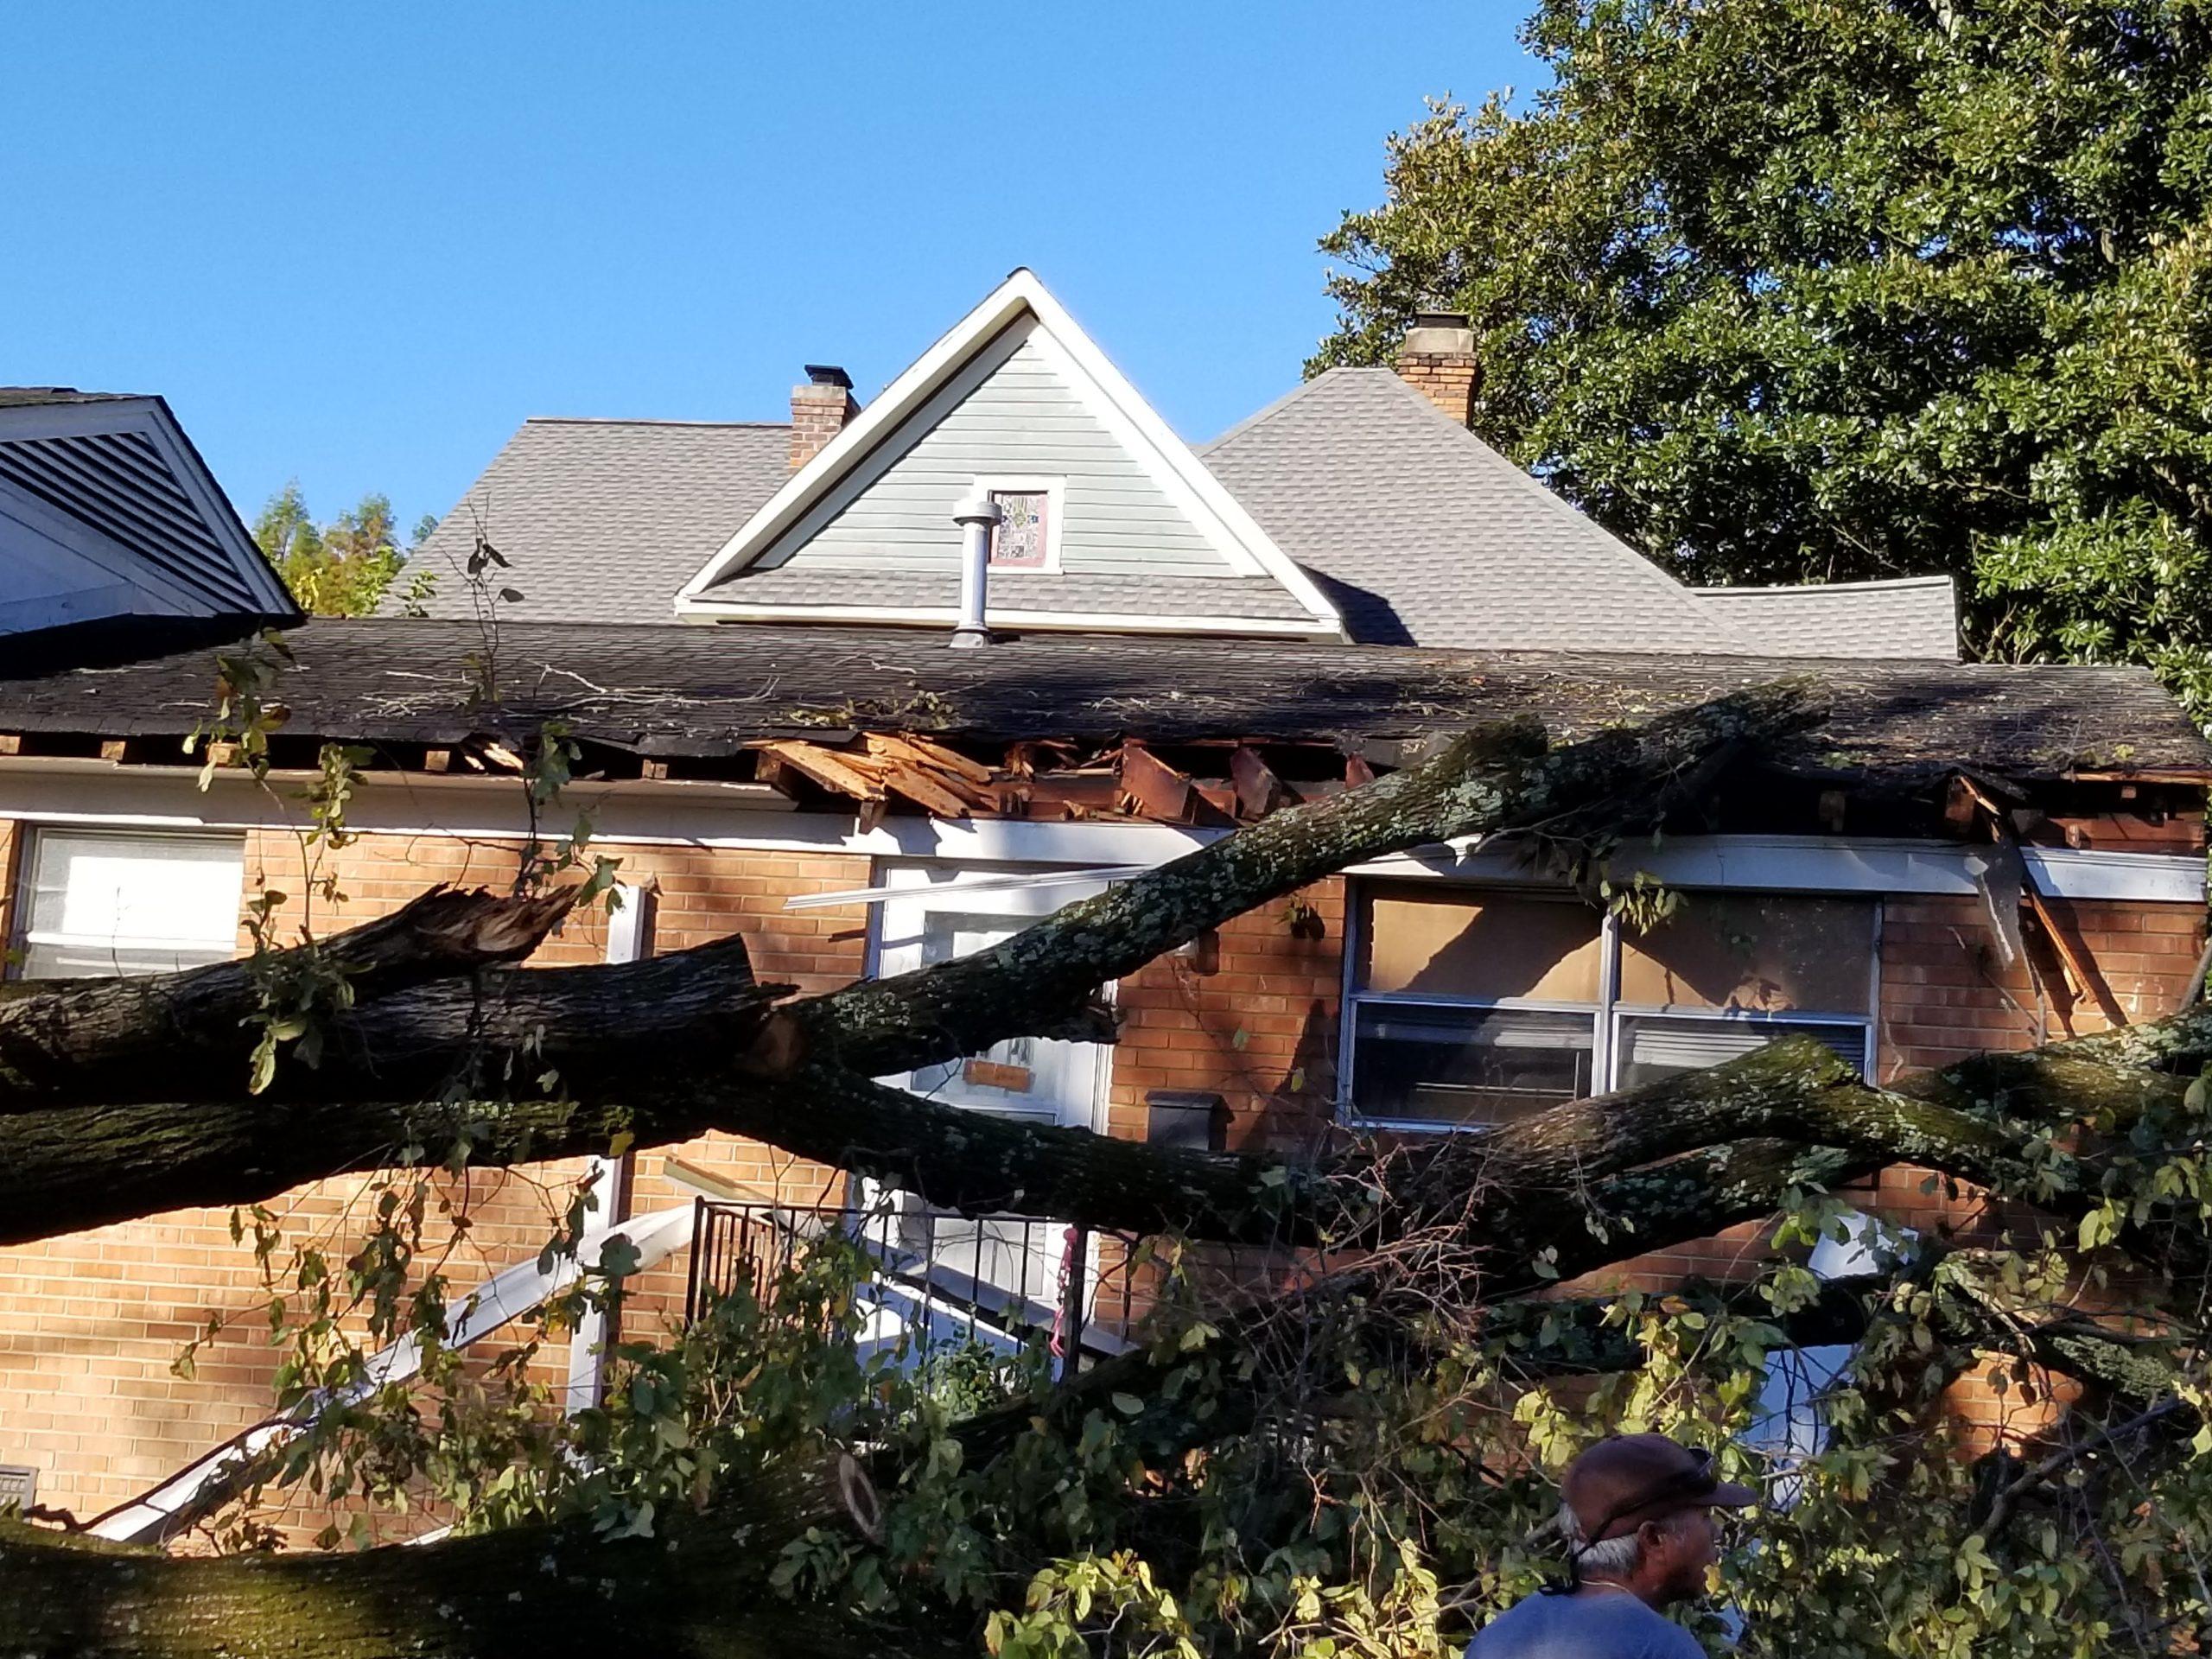 roof damaged by fallen tree